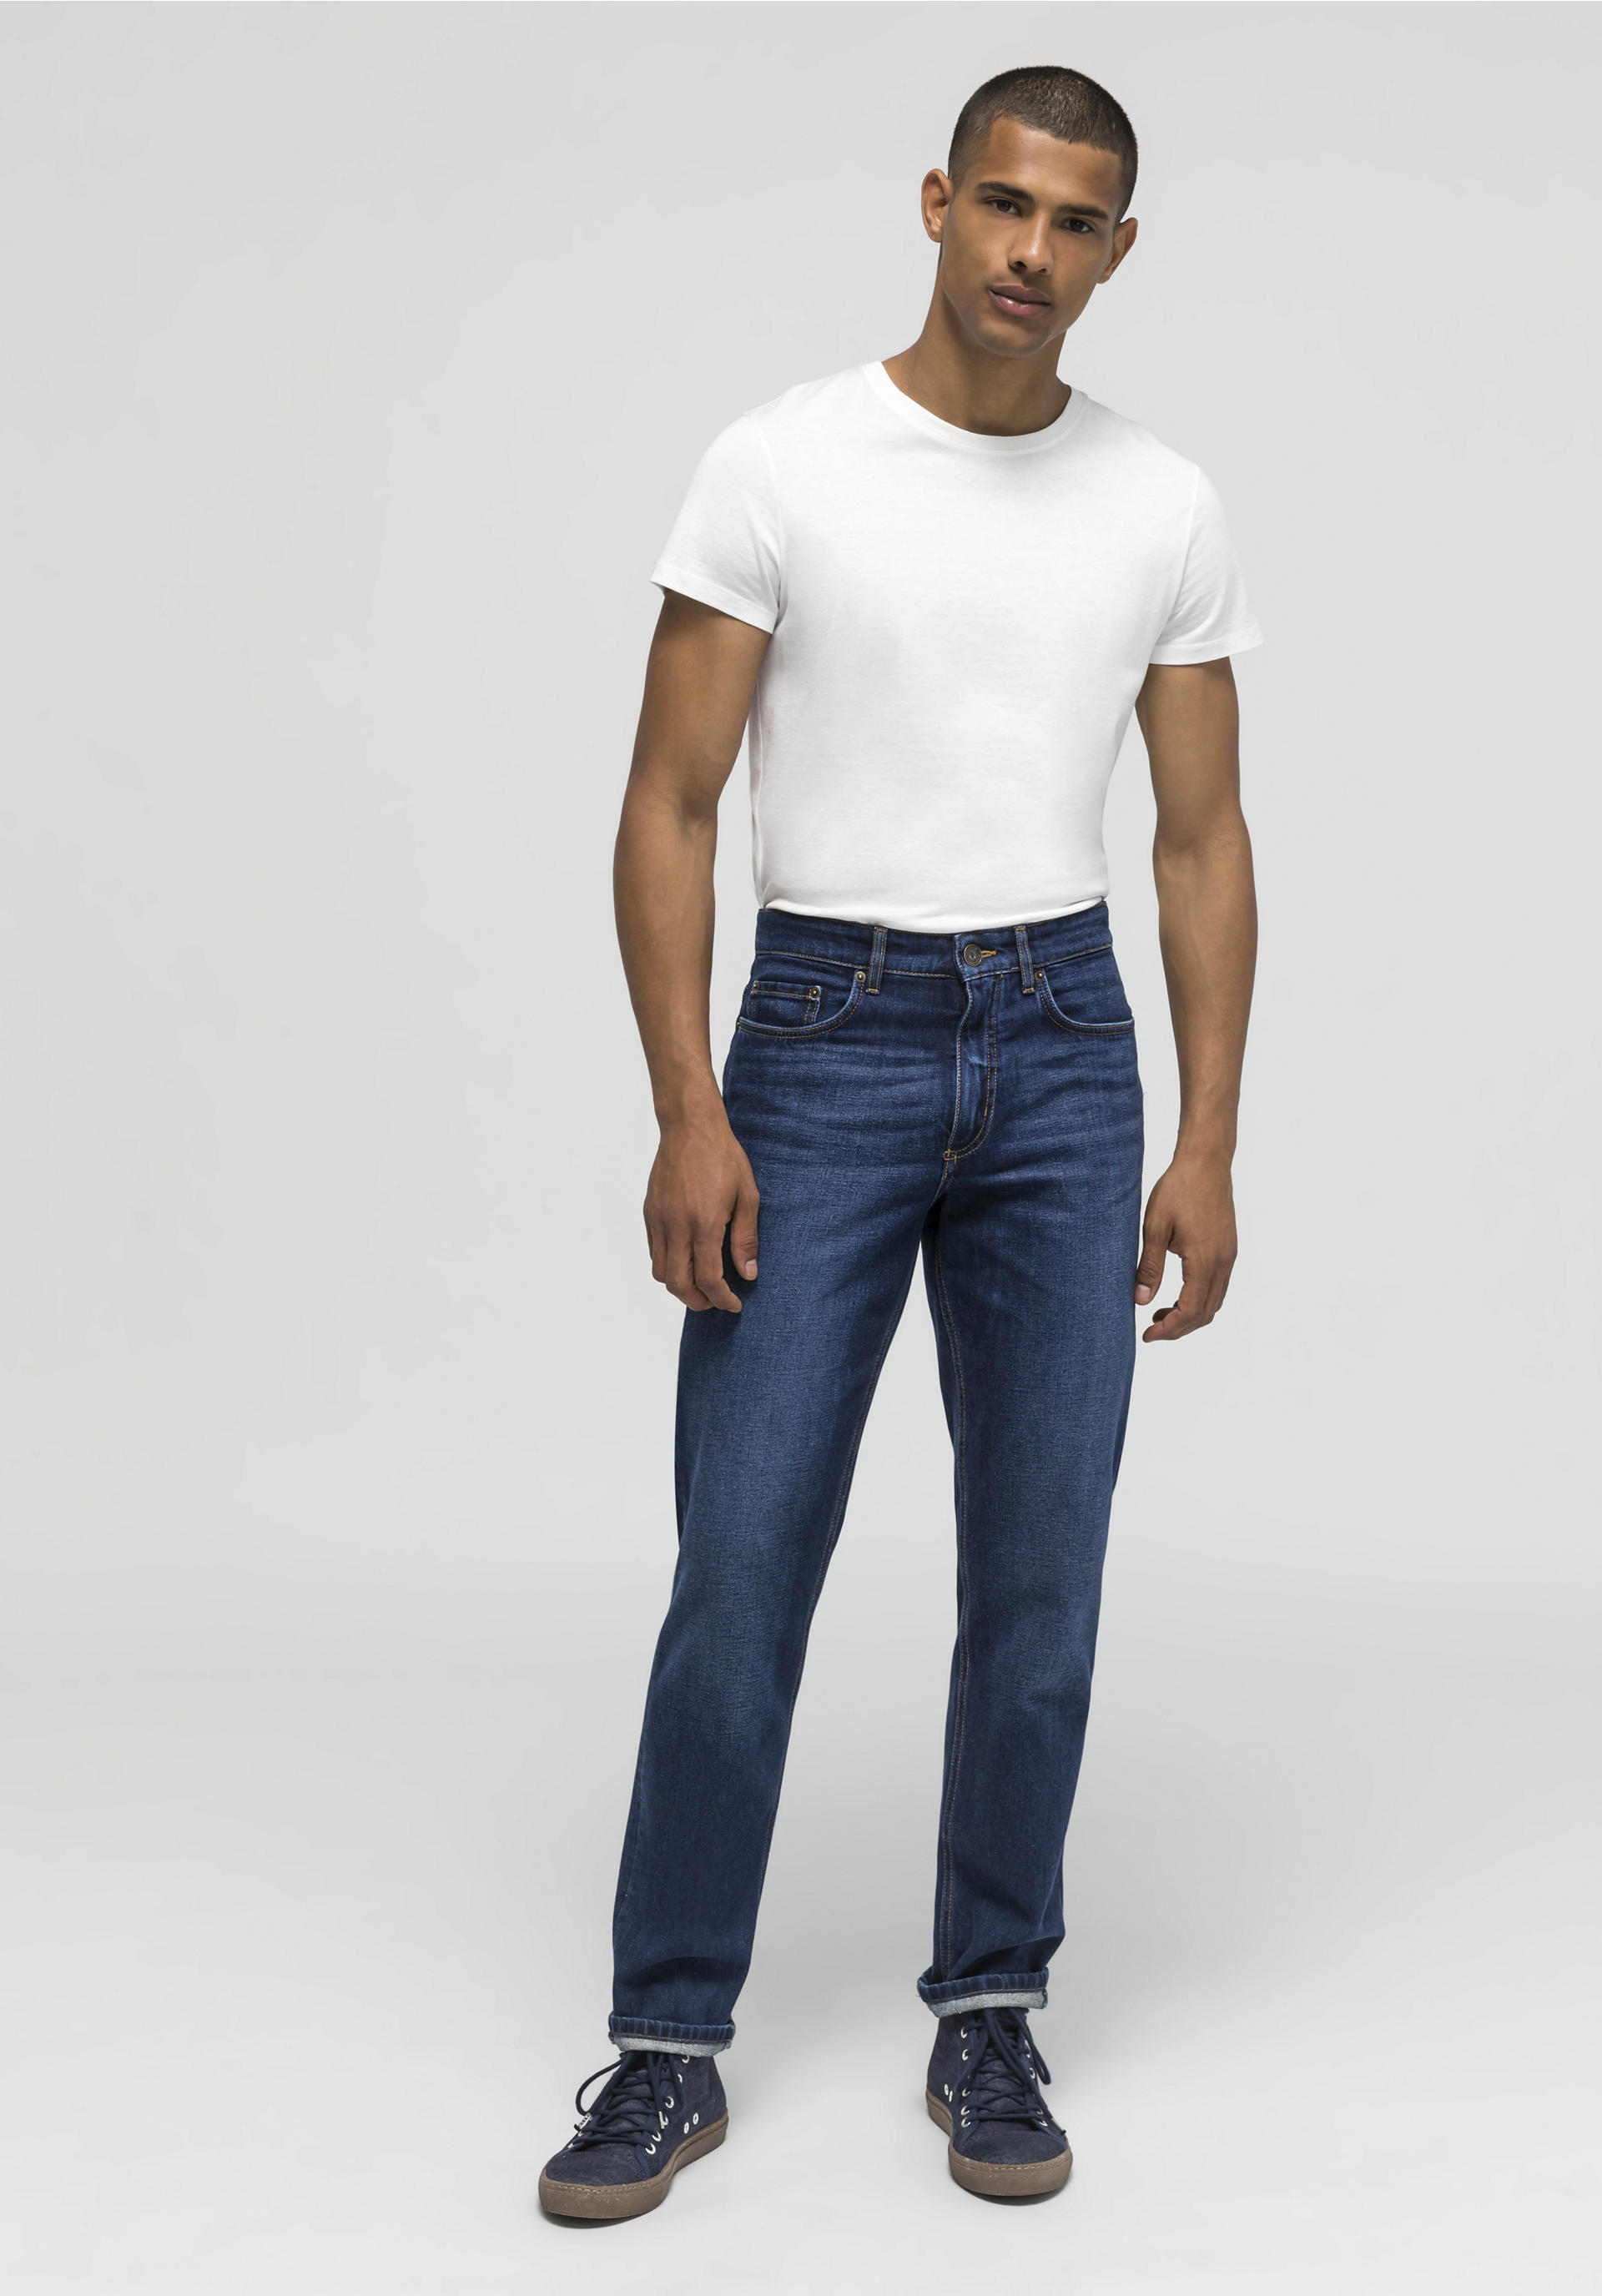 Herren Tapered Fit Jeans Bio Öko Fair! hessnatur